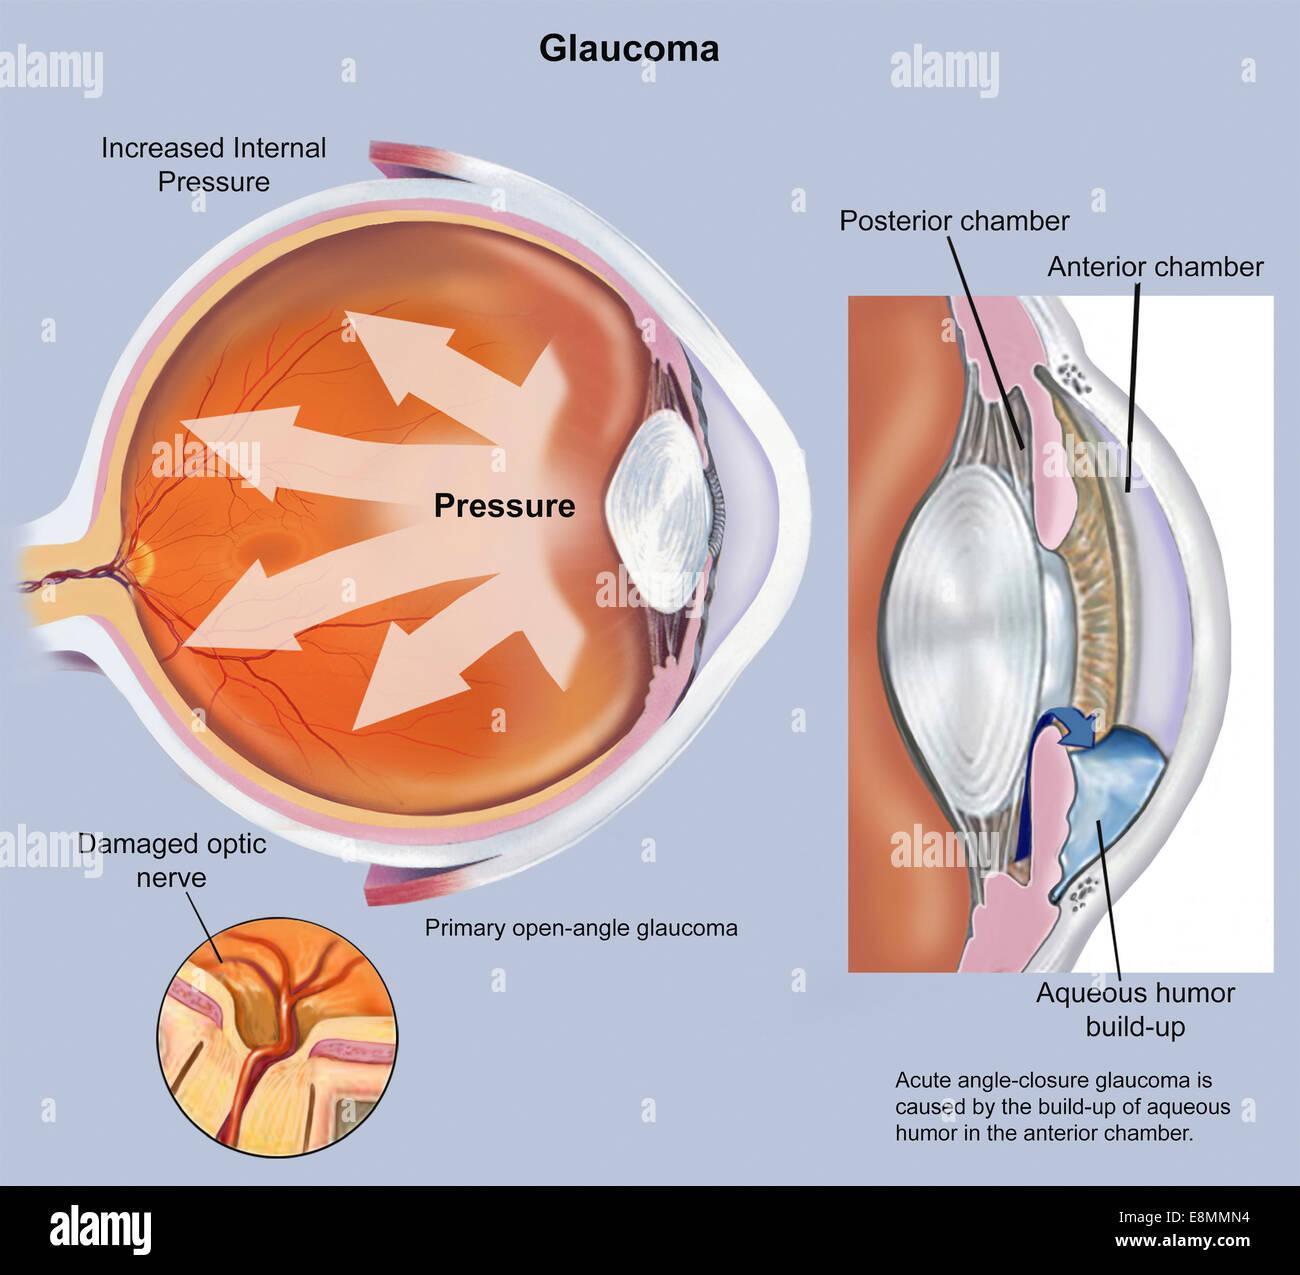 Retina of eye with glaucoma Stock Photo: 74214032 - Alamy